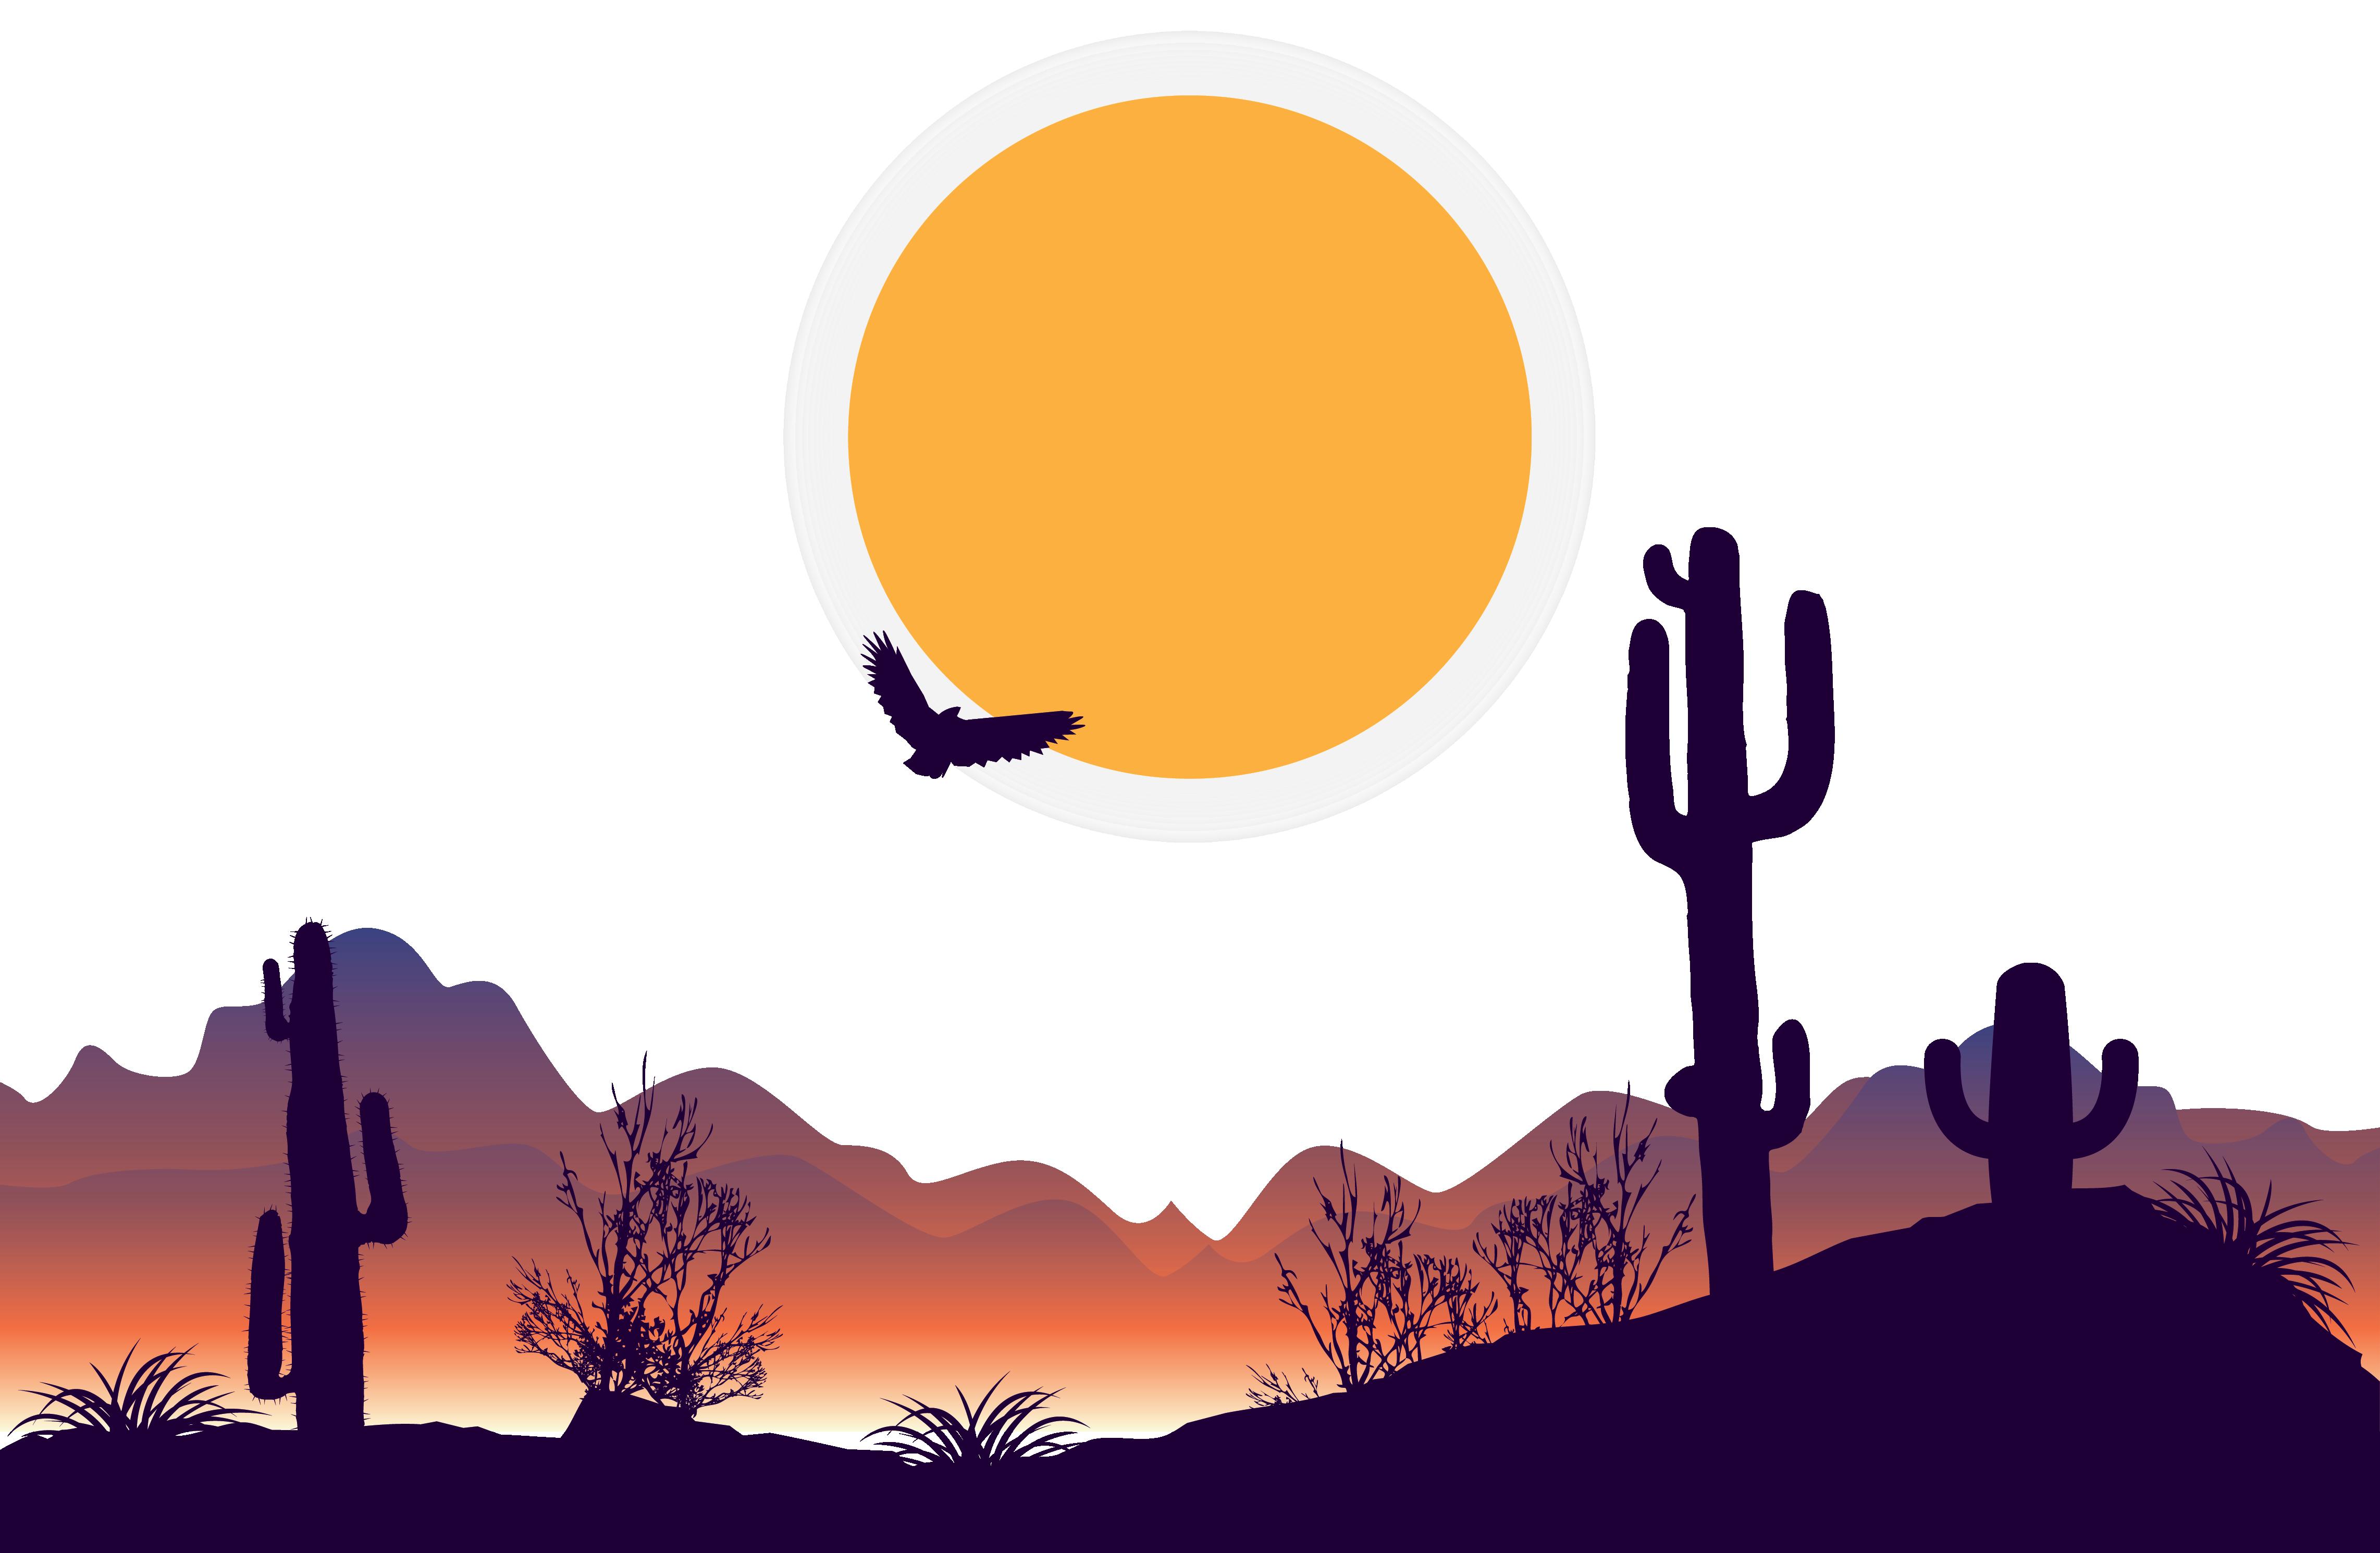 Desert background clipart vector freeuse download Desert PNG Clipart Background   PNG Mart vector freeuse download